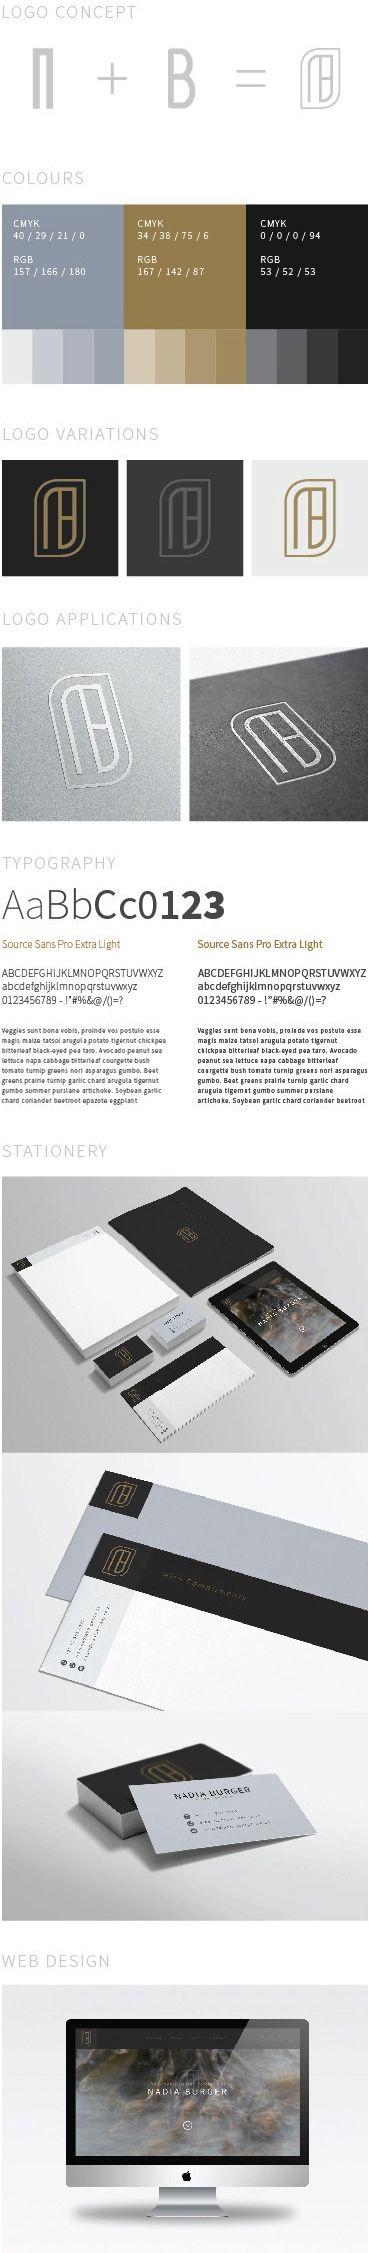 Identity for Nadia Burger Design via Behance